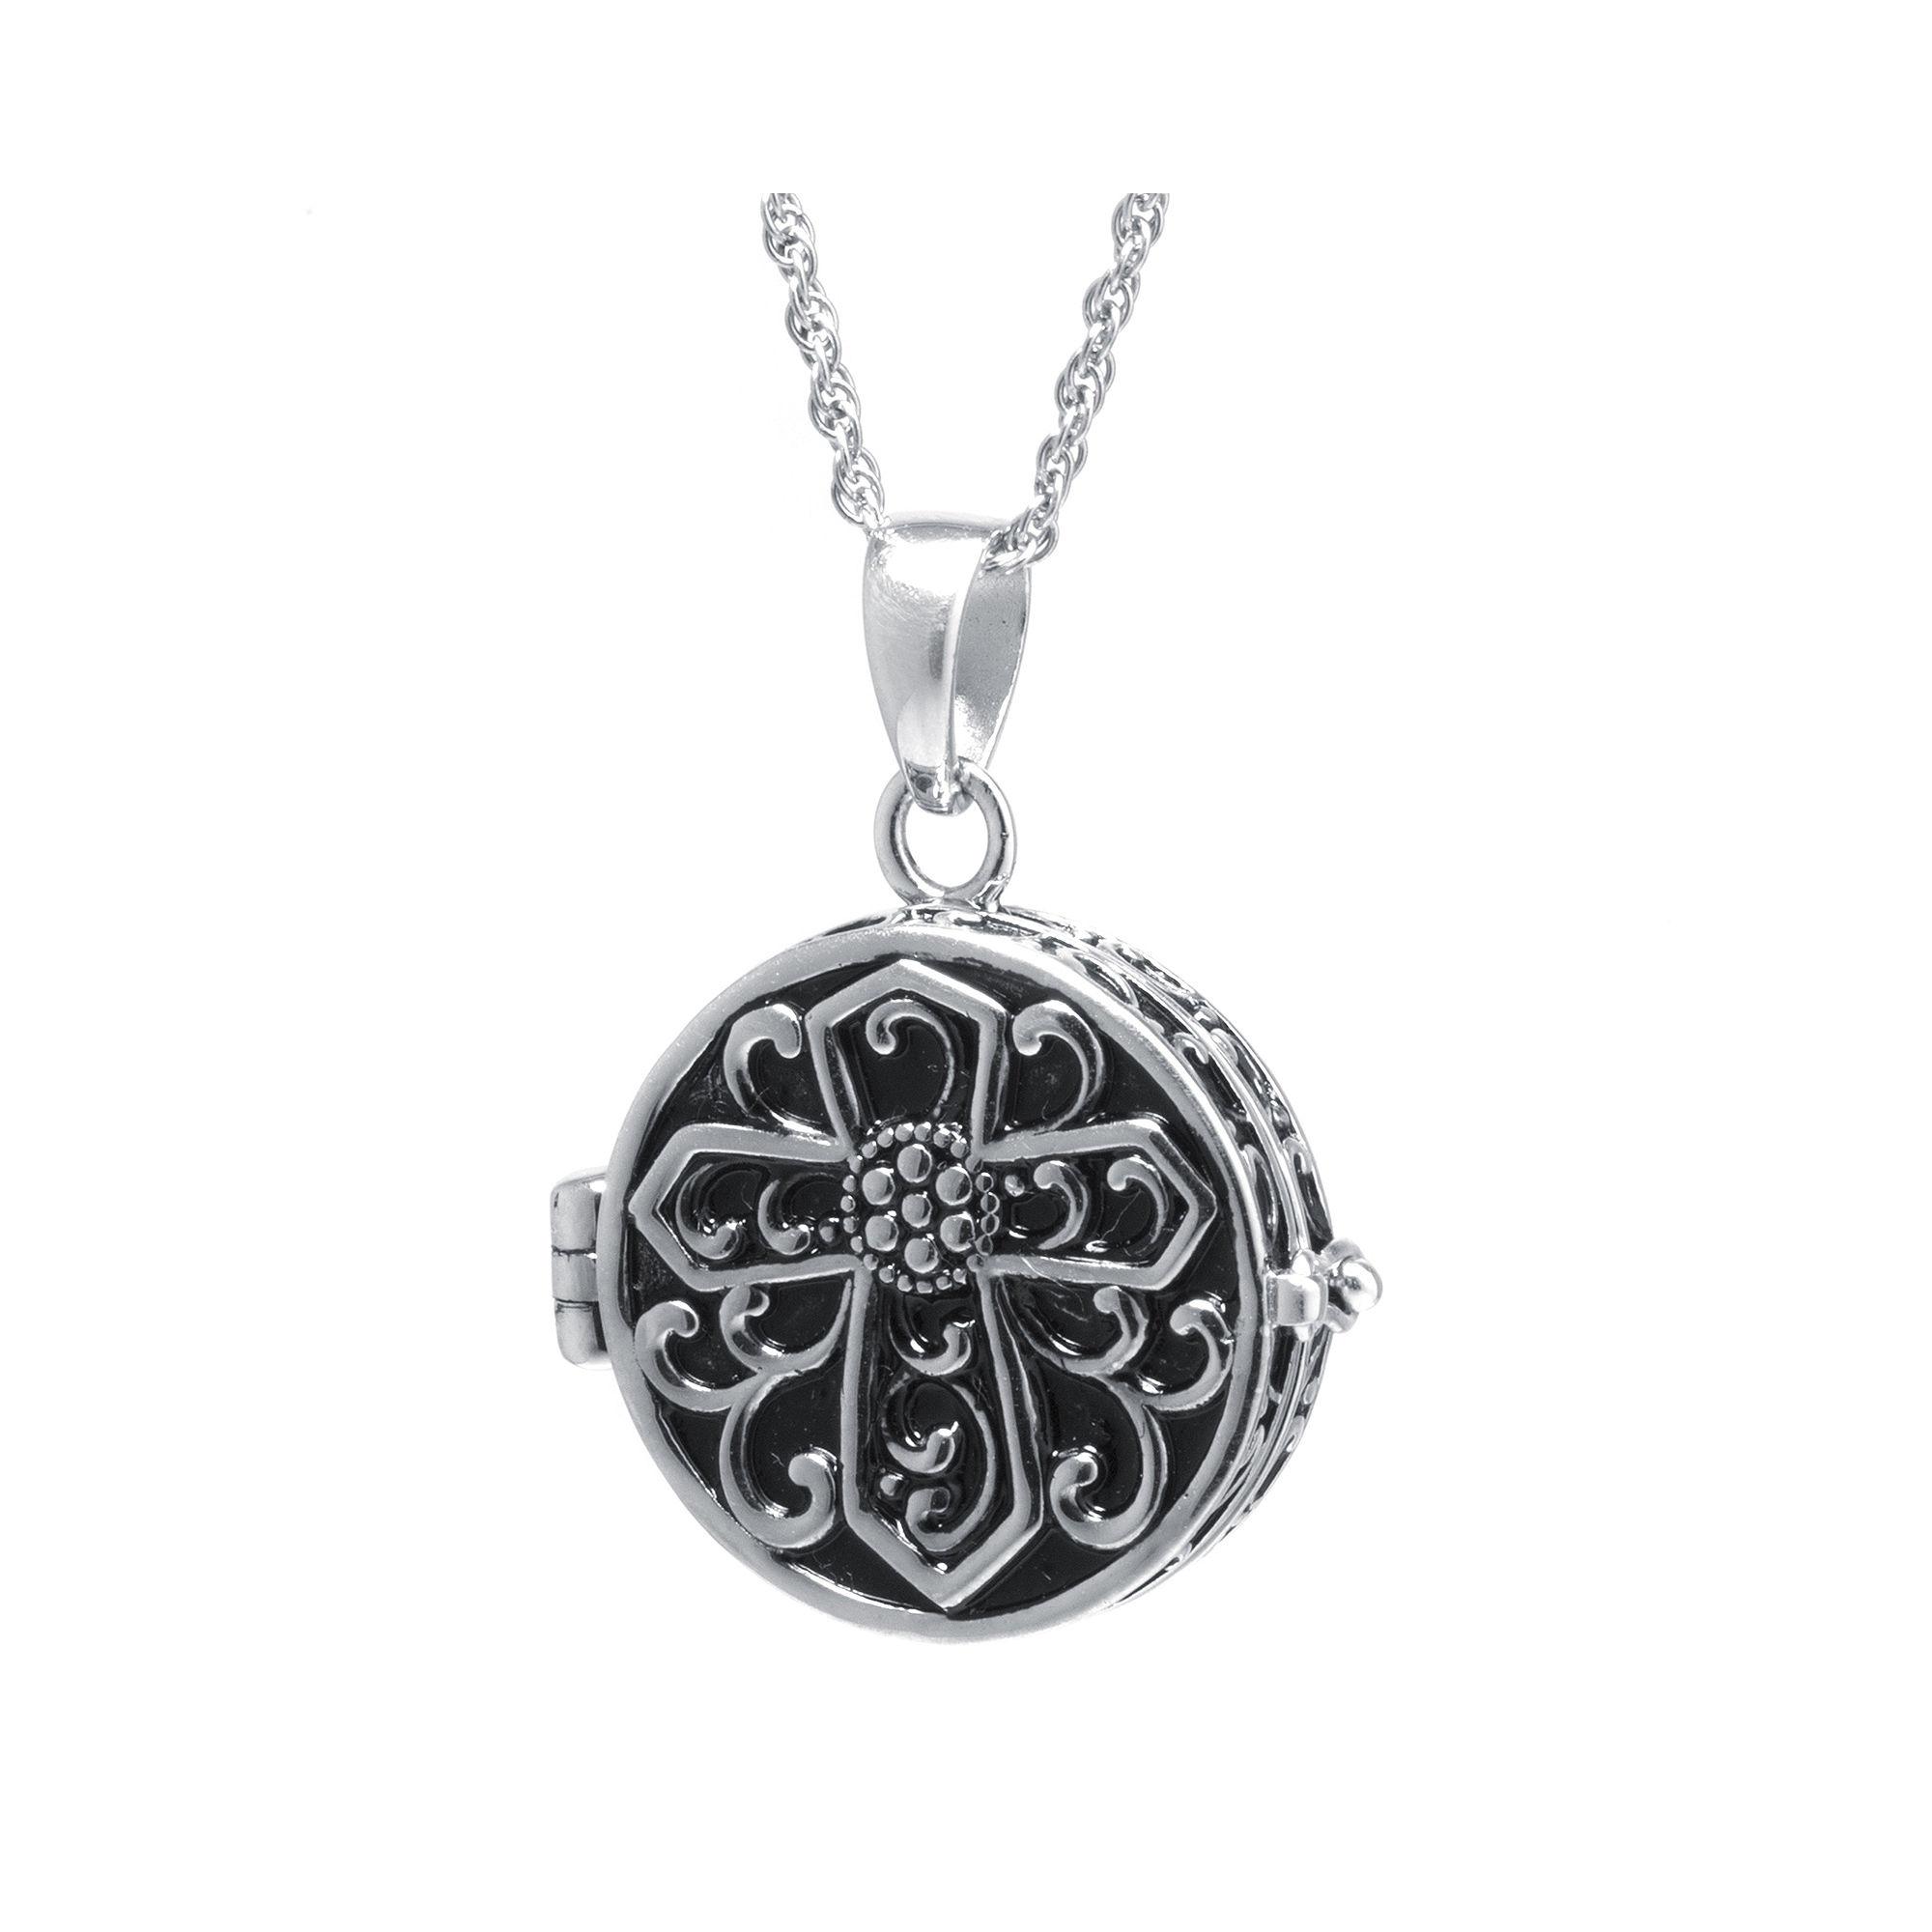 Sterling Silver Vintage-Inspired Cross Prayer Box Pendant Necklace